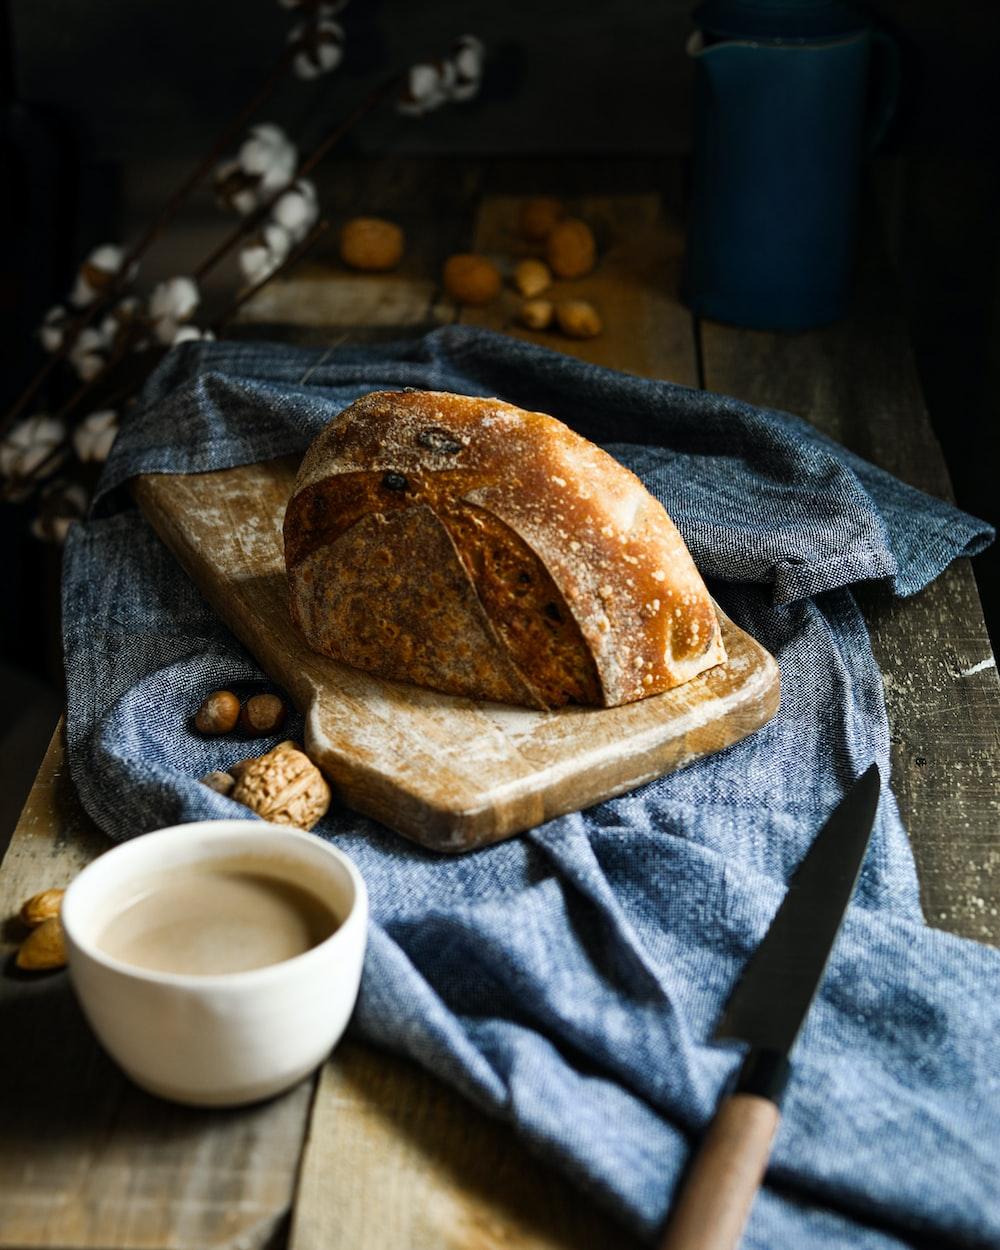 brown bread on brown paper bag beside white ceramic mug